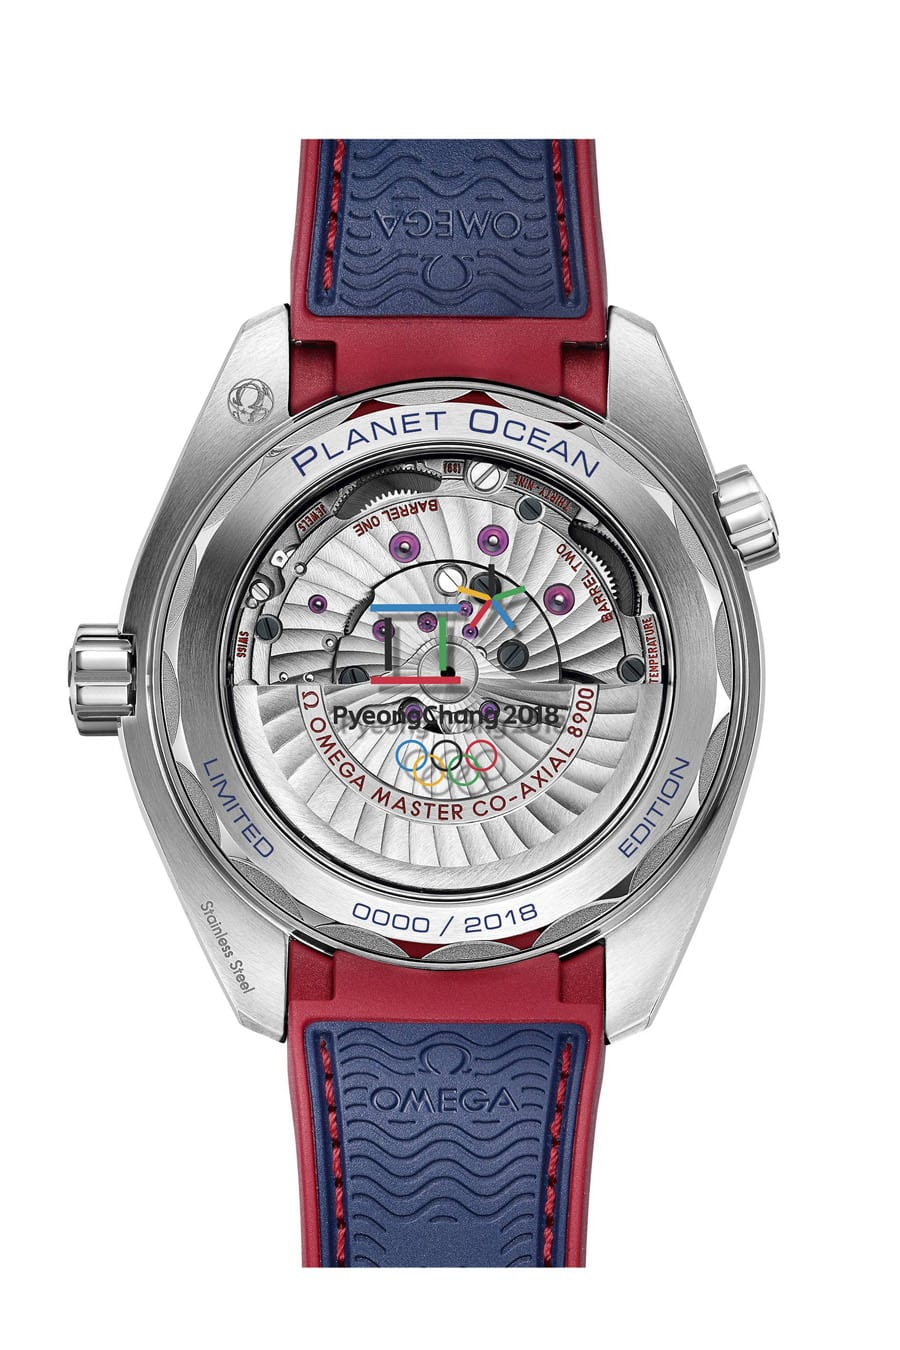 "Die Omega Seamaster Planet Ocean ""PyeongChang 2018"" ist mit dem Kaliber Co-Axial Master Chronometer 8900 ausgesattet"